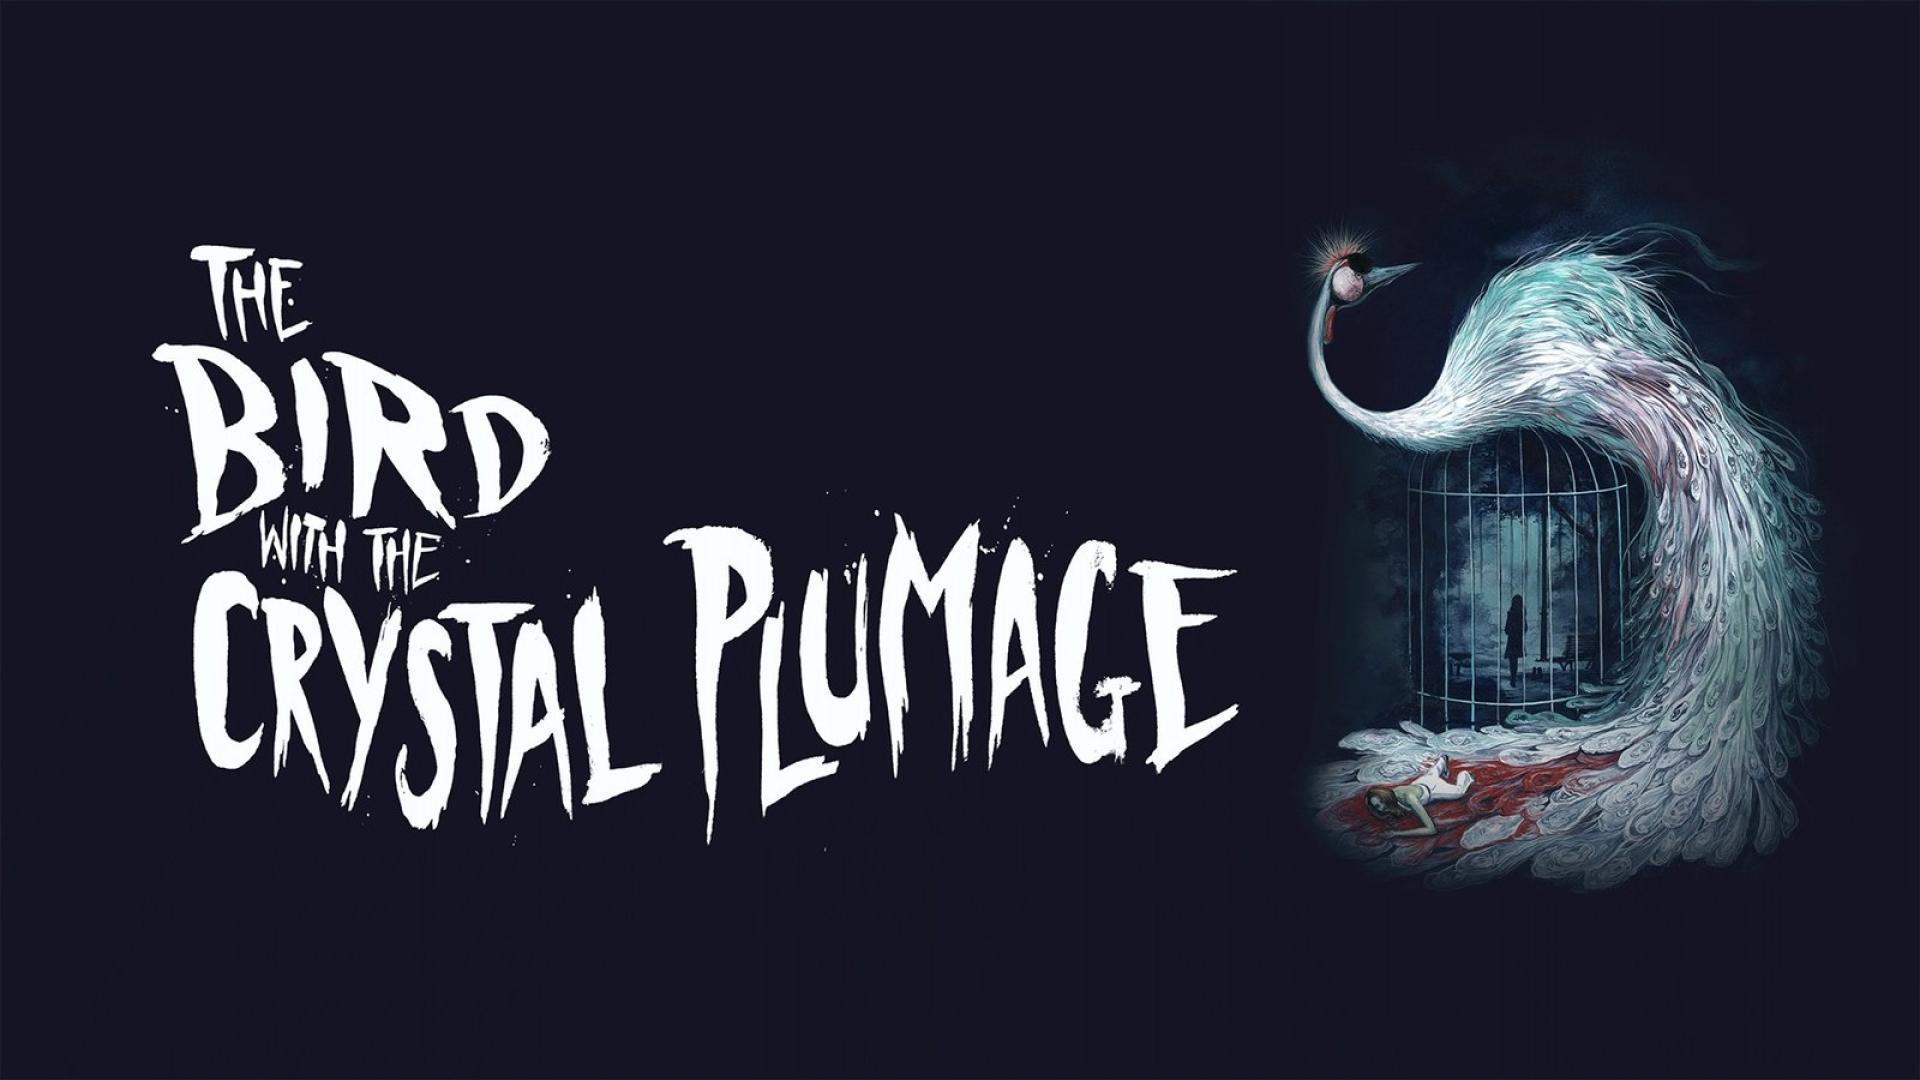 L'uccello dalle piume di cristallo / The Bird with the Crystal Plumage / Kristálytollú madár (1970)